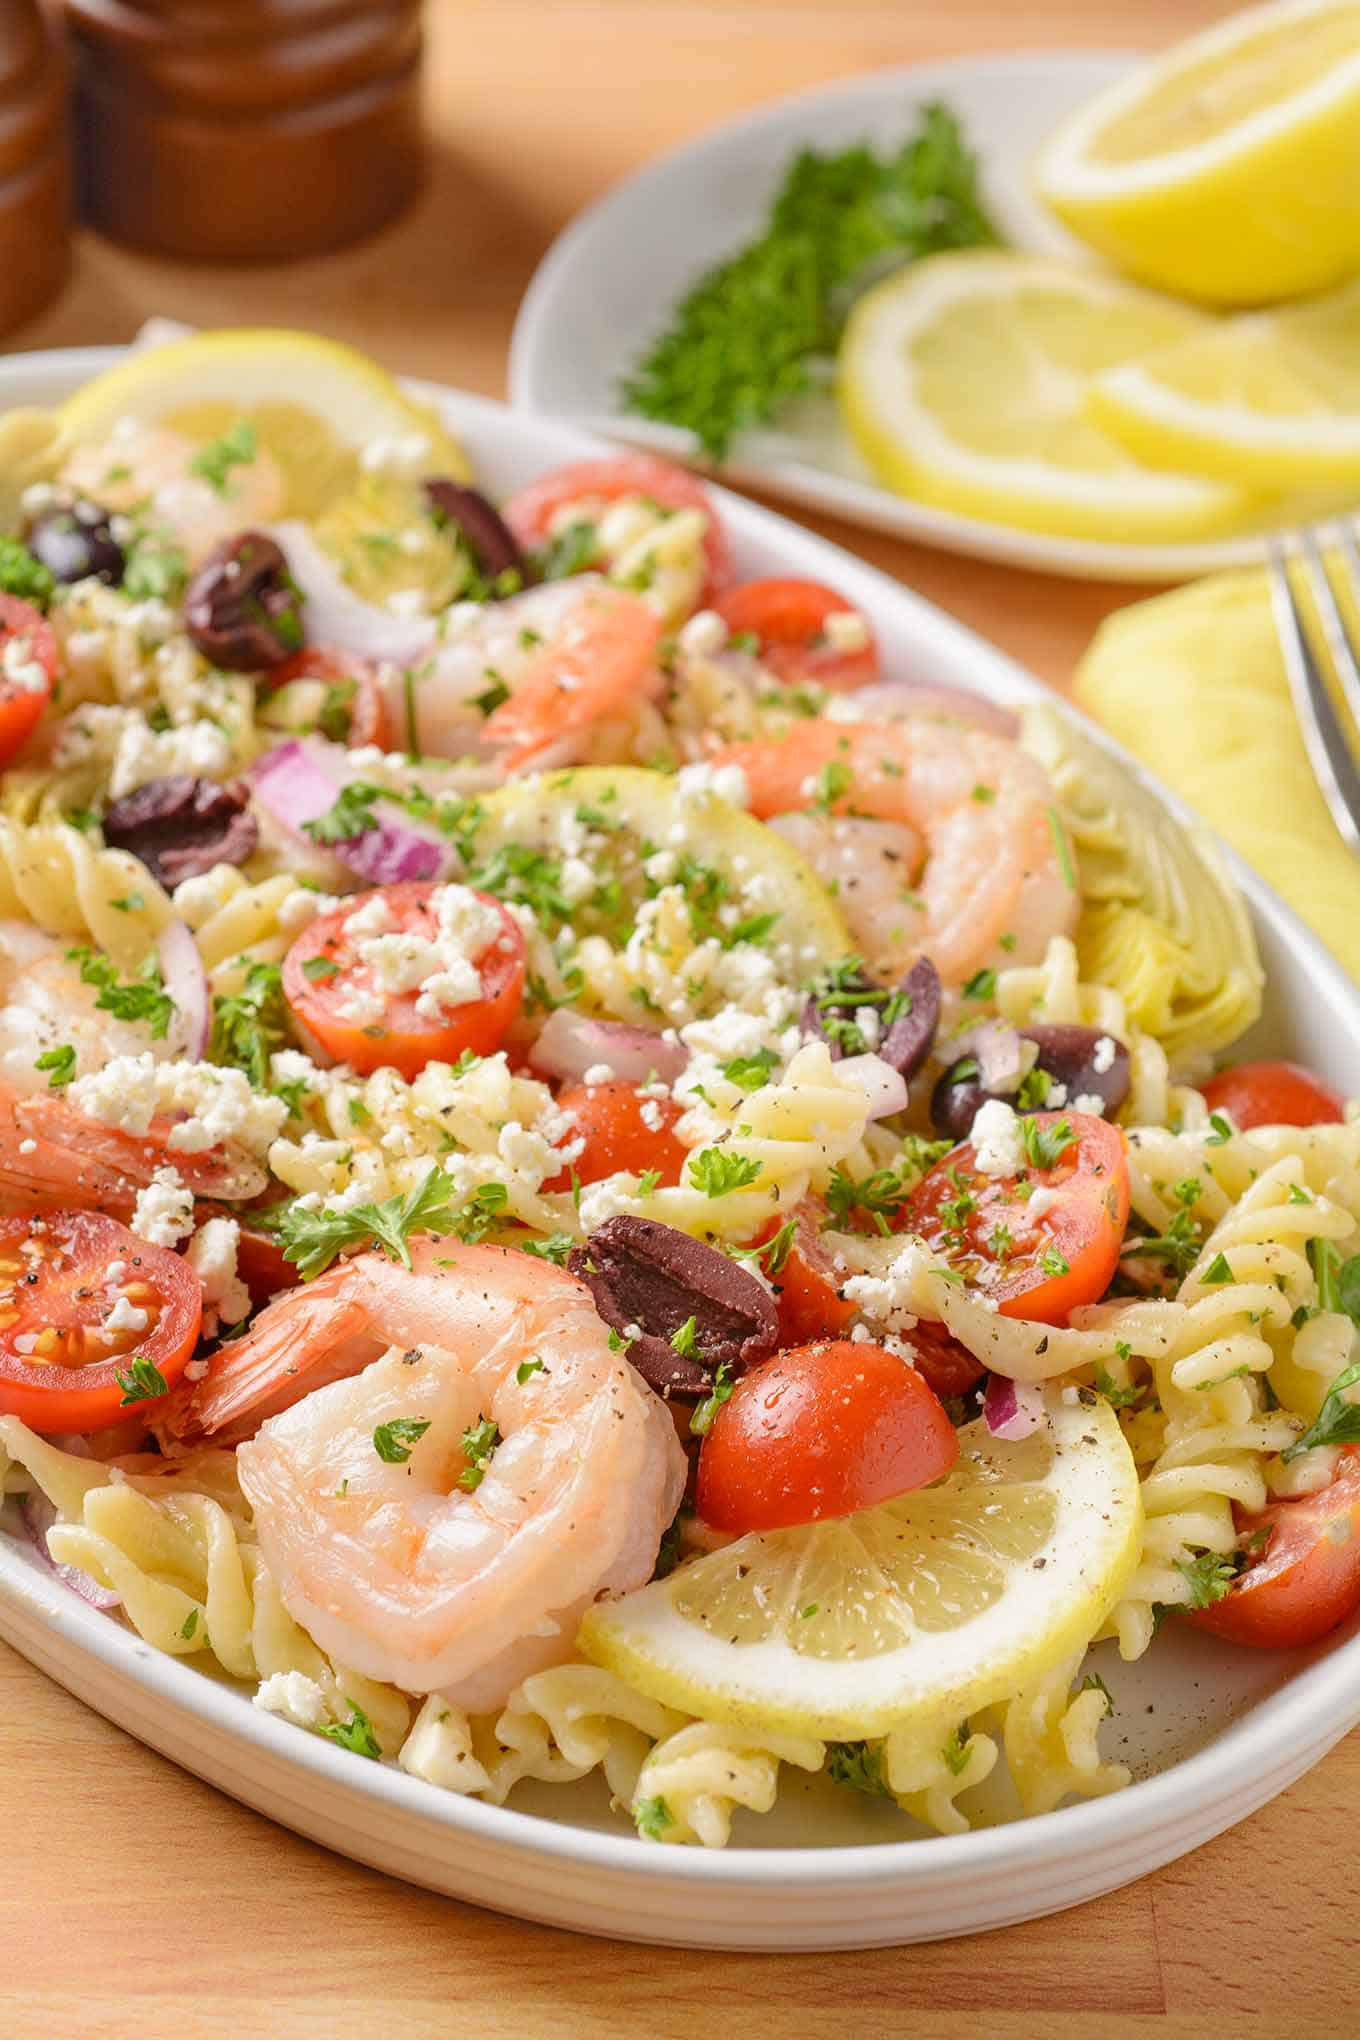 Rotini pasta salad with shrimp, artichoke hearts, Kalamata olives, cherry tomatoes, lemon, and feta cheese.